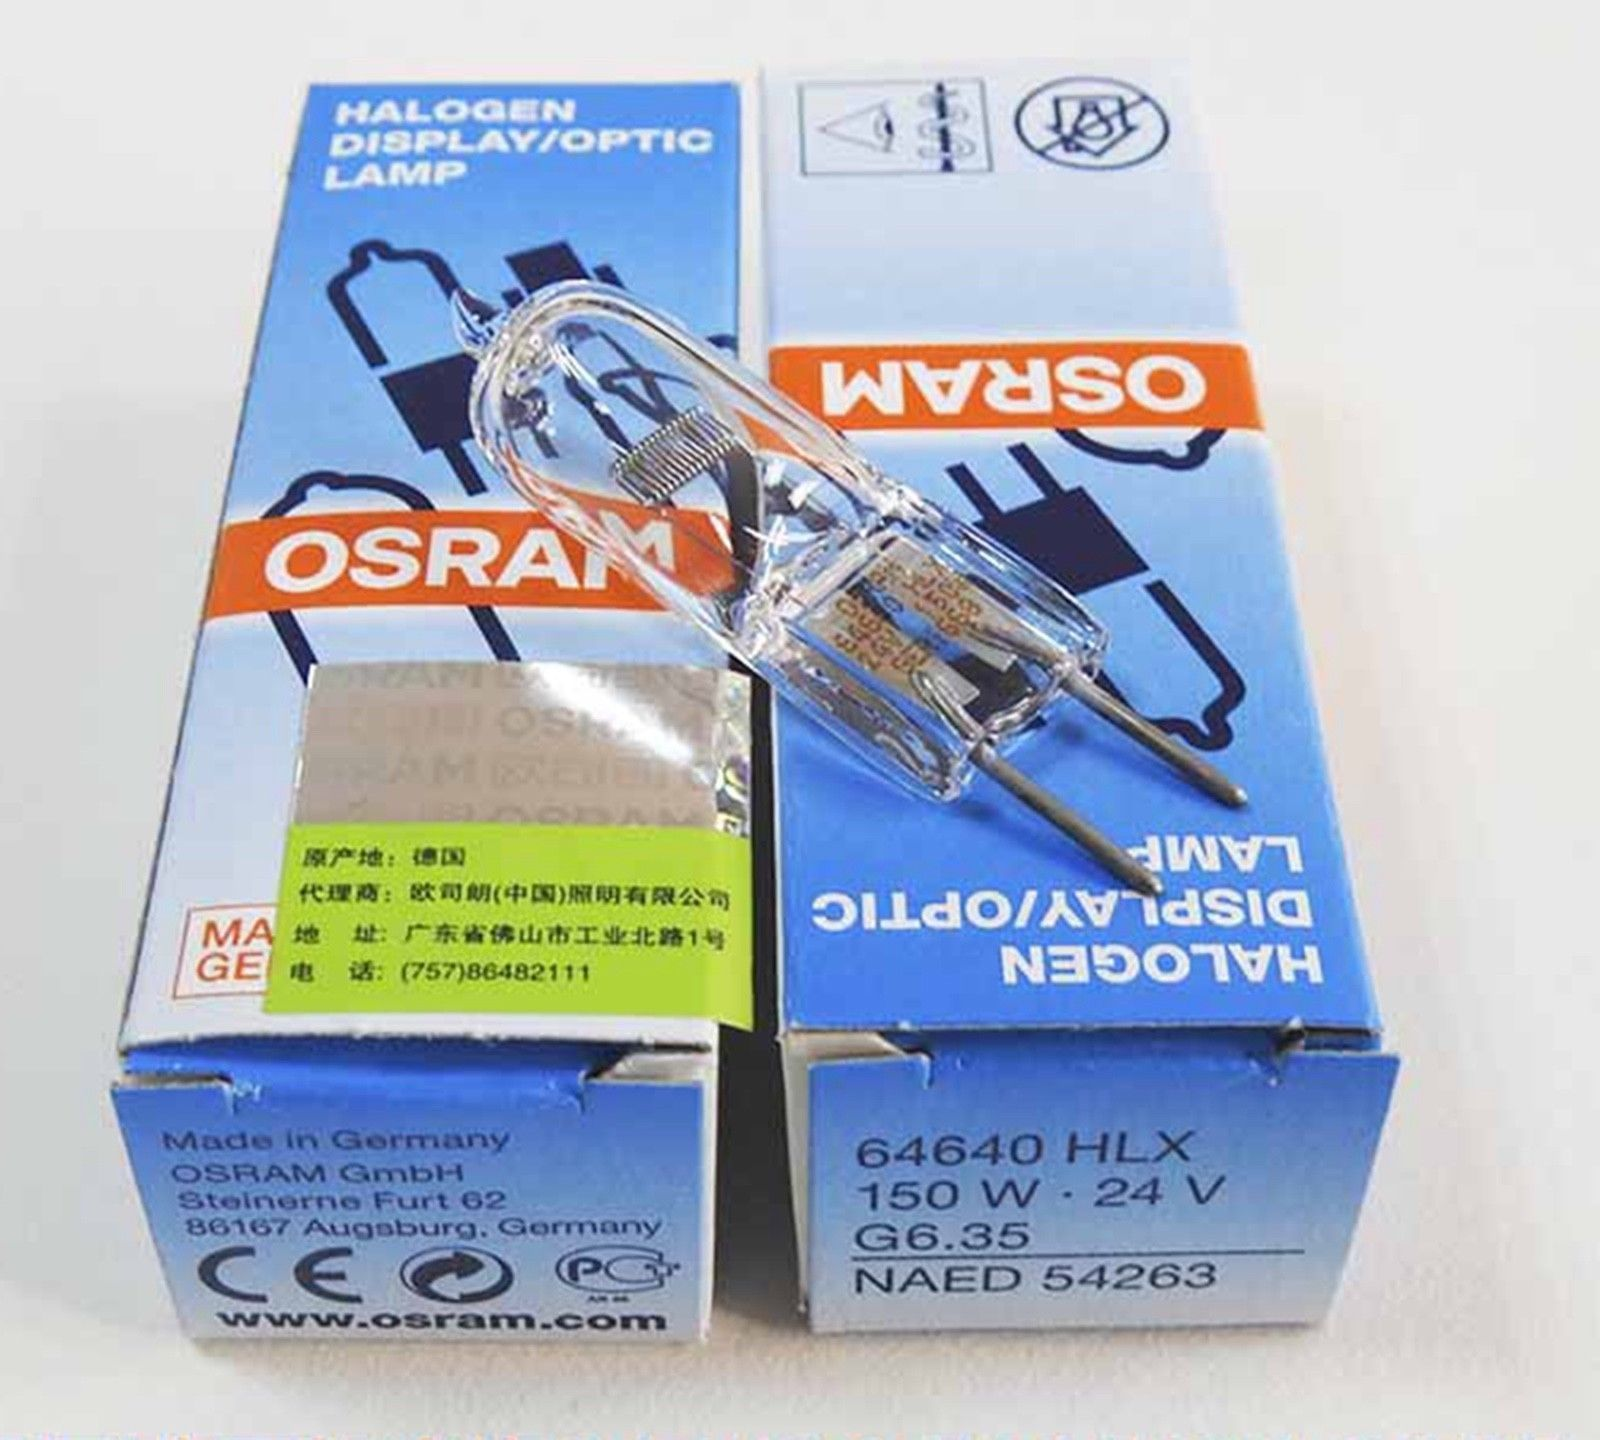 10 коробок Osram 64640 HLX 24V150W G6.35 хирургическая галогеновая лампа без тени